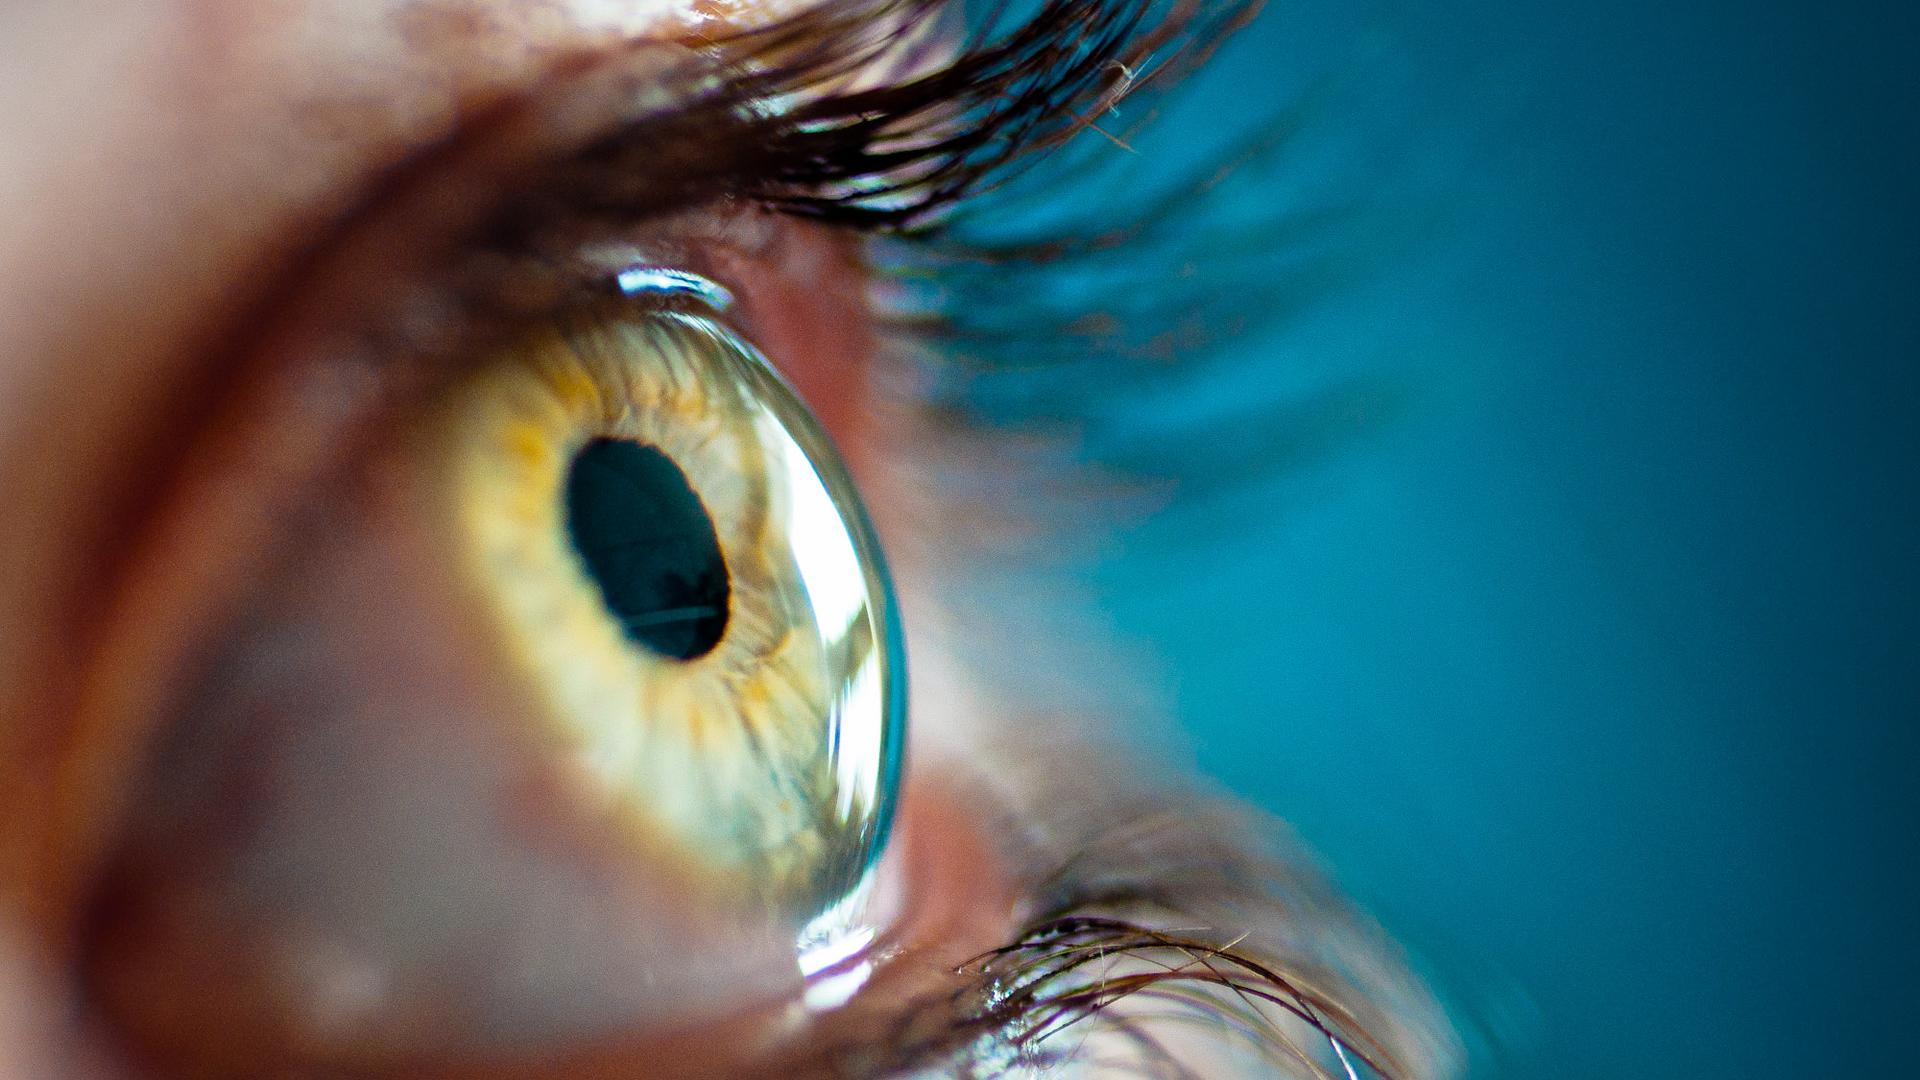 Eye Retina Iris HD Wallpaper 1080p HD Wallpapers 1920x1080